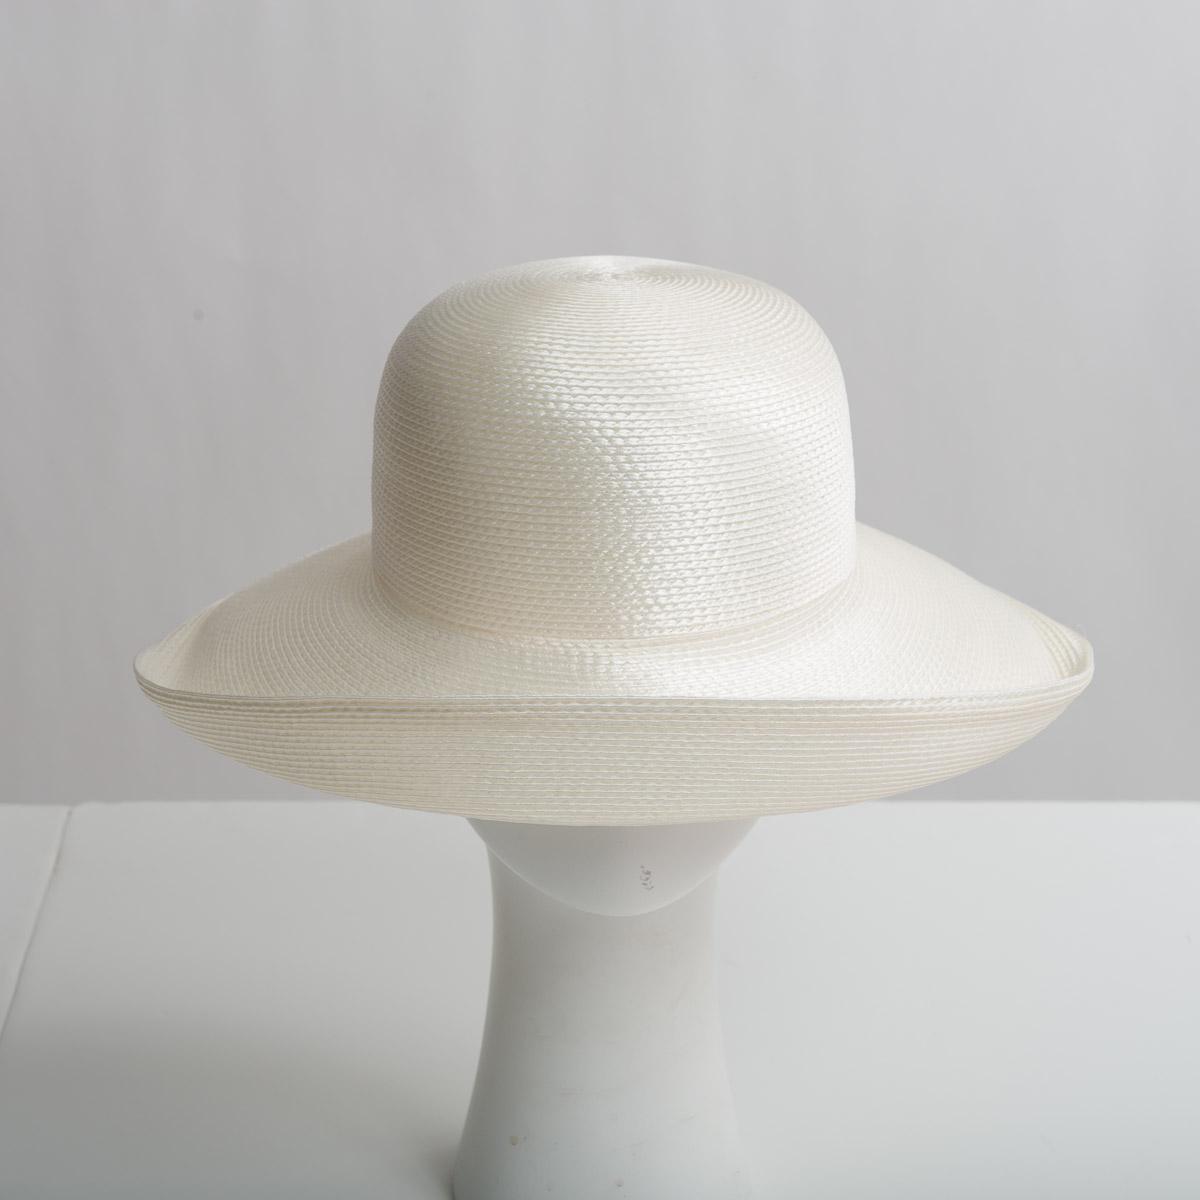 0065b6c38e85fb Ivory Polypropylene Straw Medium Brim Plain Hats-CK01R-0-25- Sun Yorkos |  Zoria